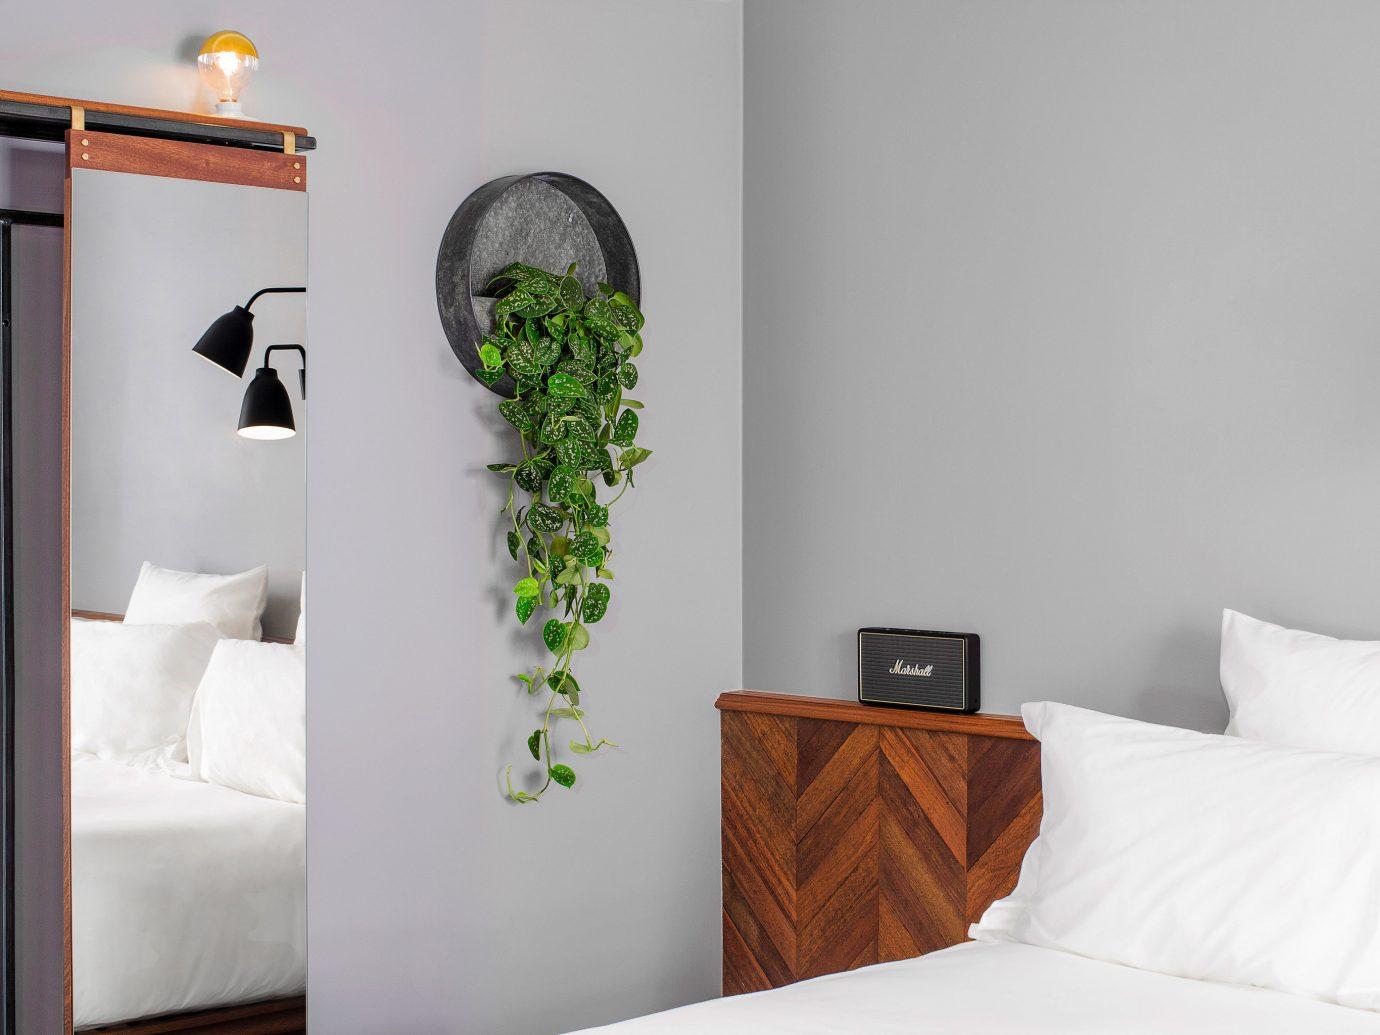 bed wall indoor room pillow furniture interior design Bedroom home shelf hotel Suite bed frame